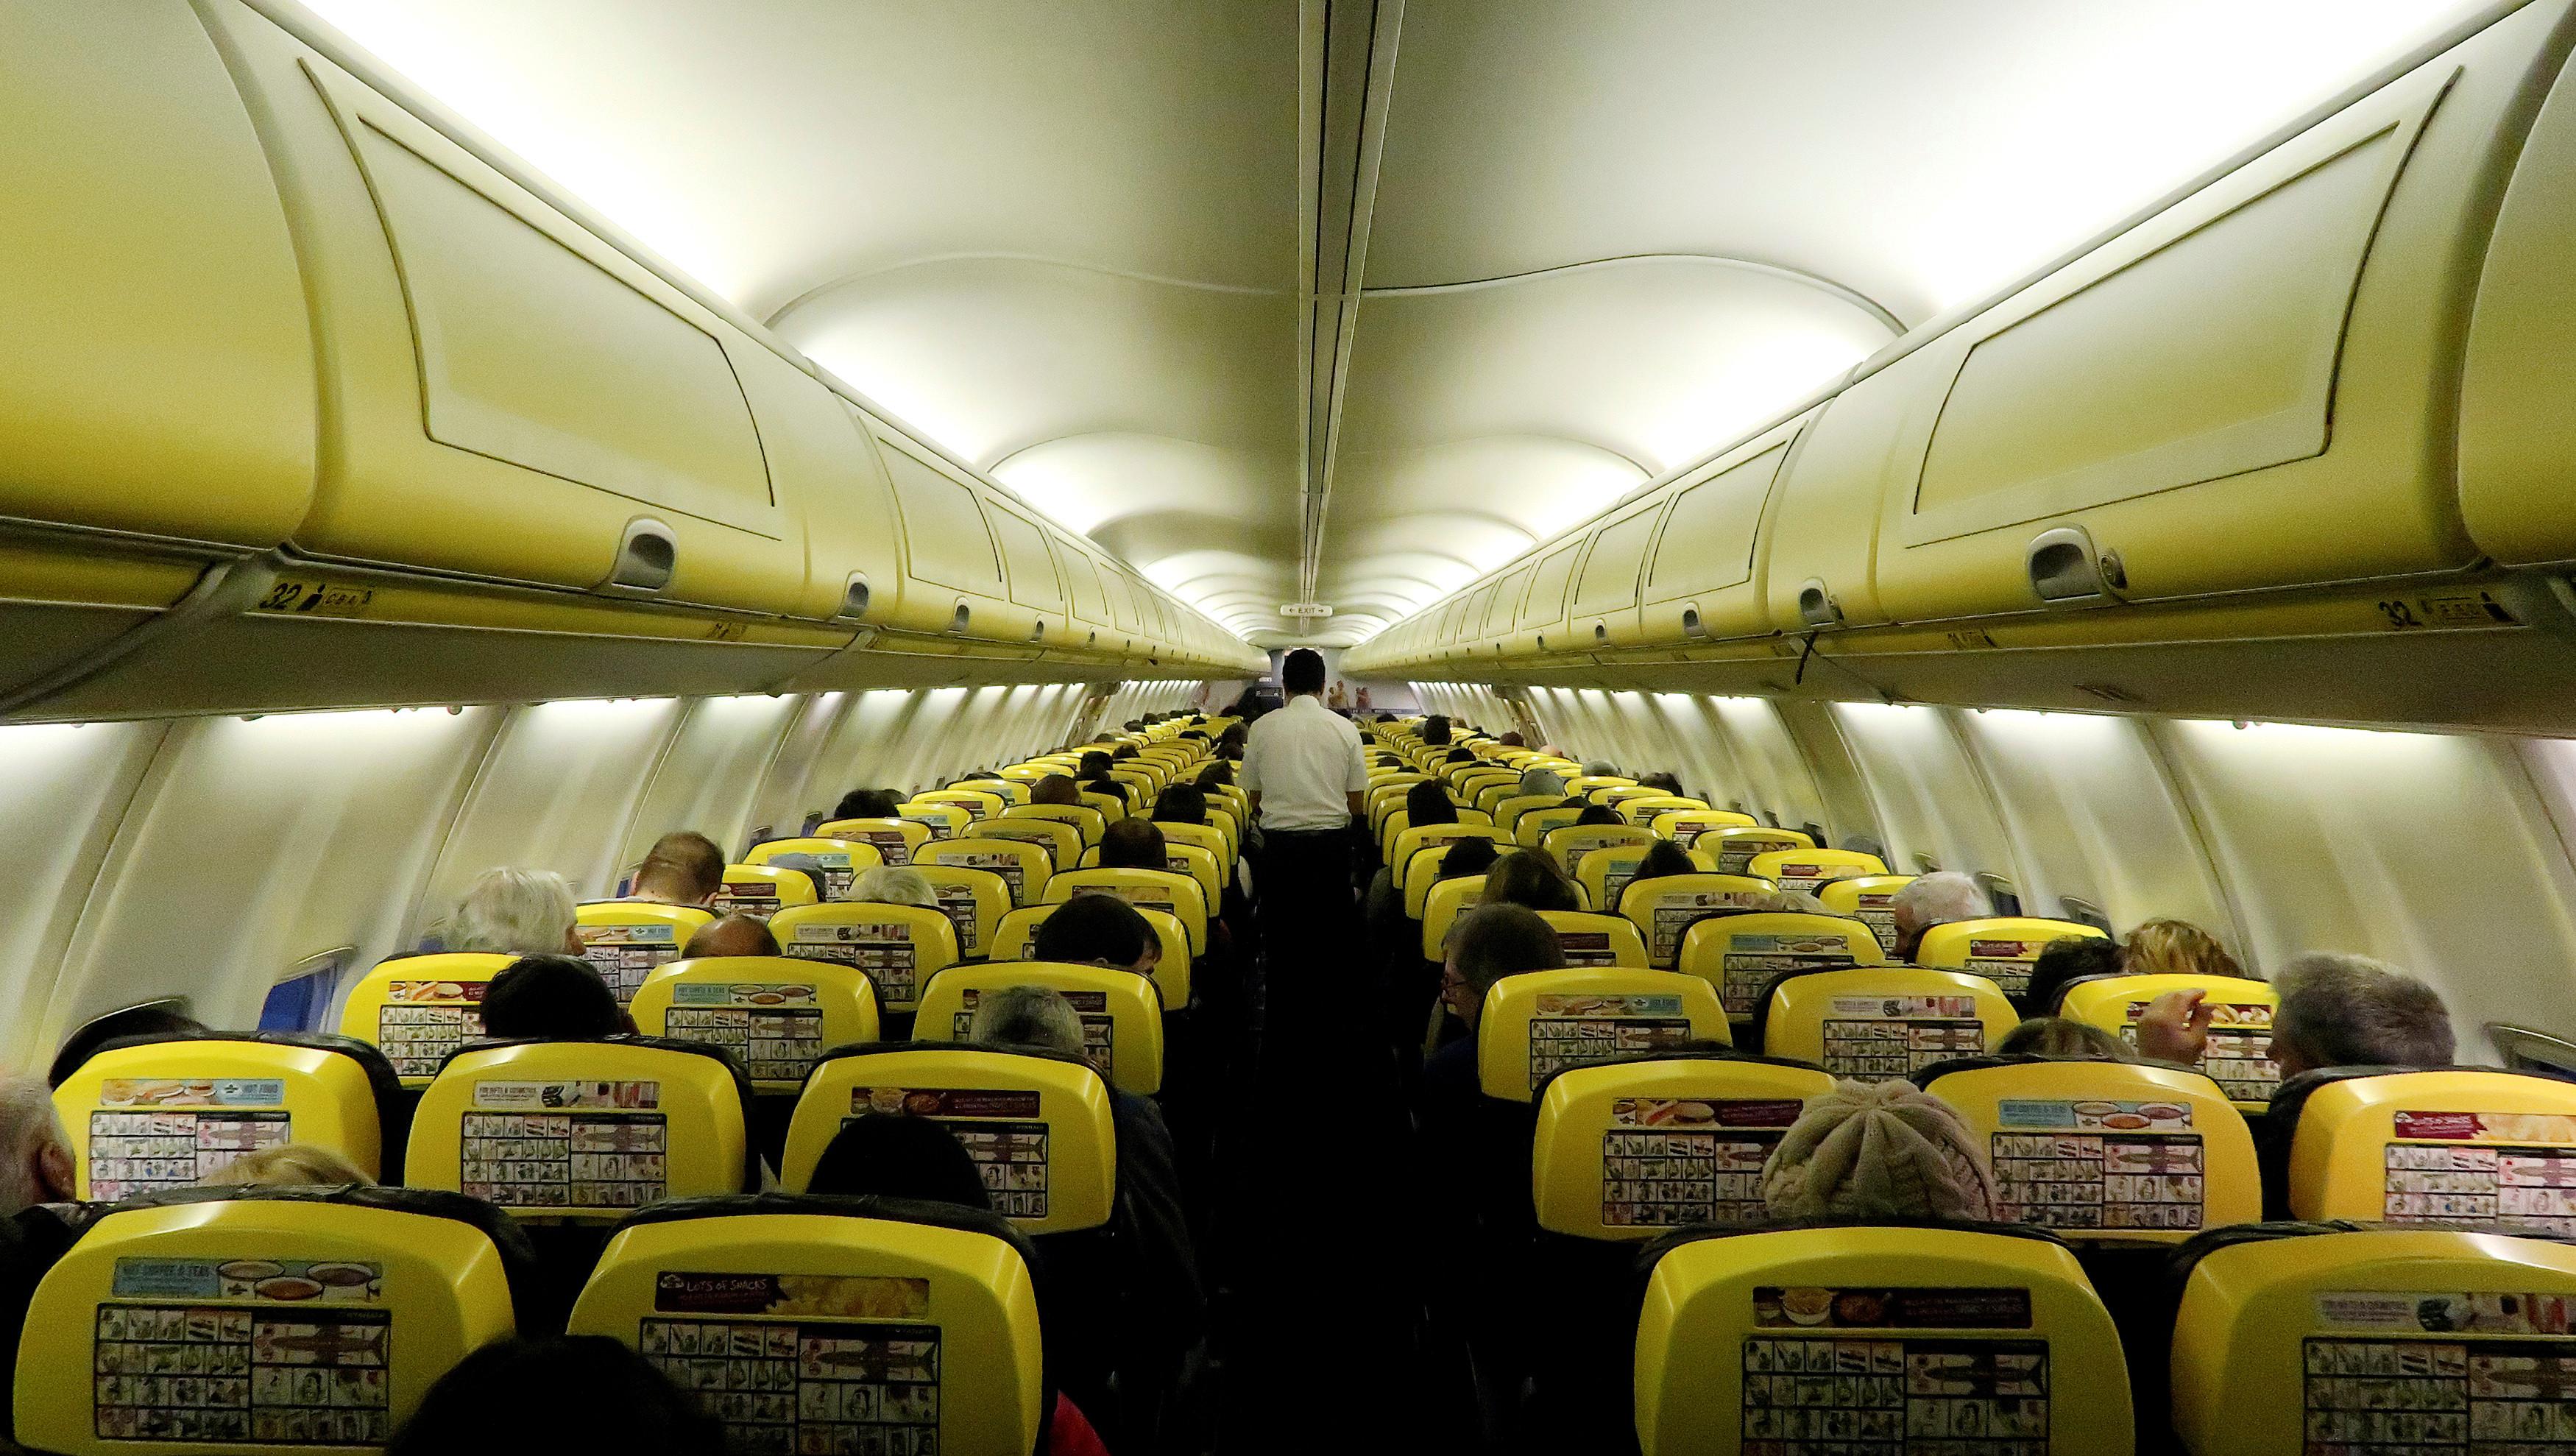 Sindicato vai agir contra despedimento de tripulantes que se 'indignaram'